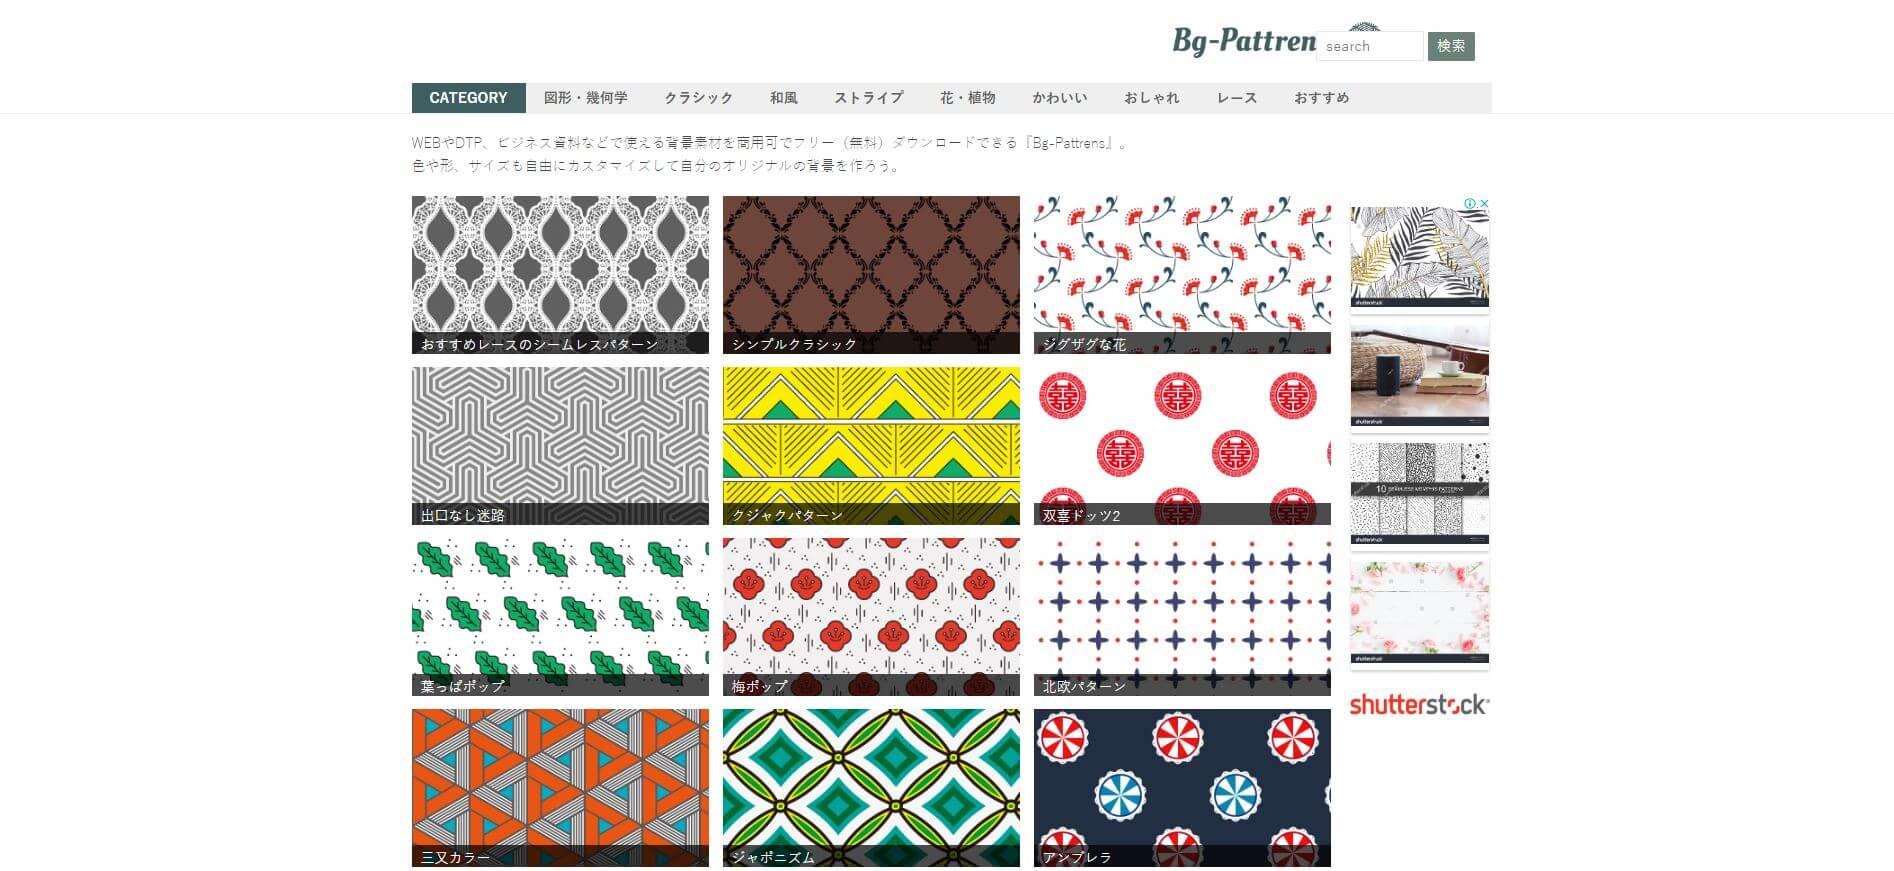 Bg-patternsのトップページ